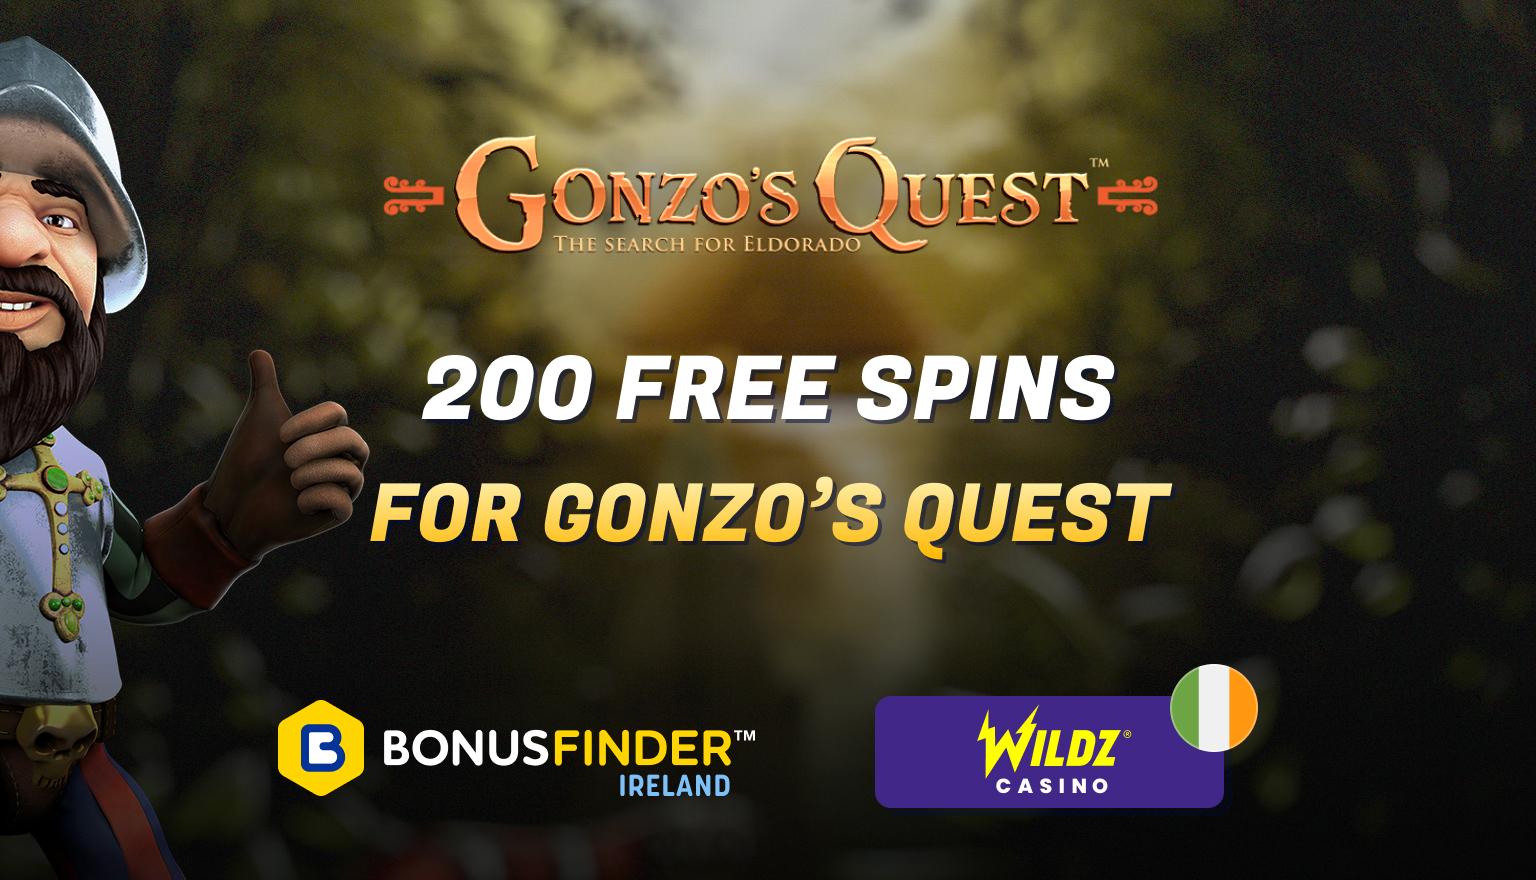 gonzos quest free spins